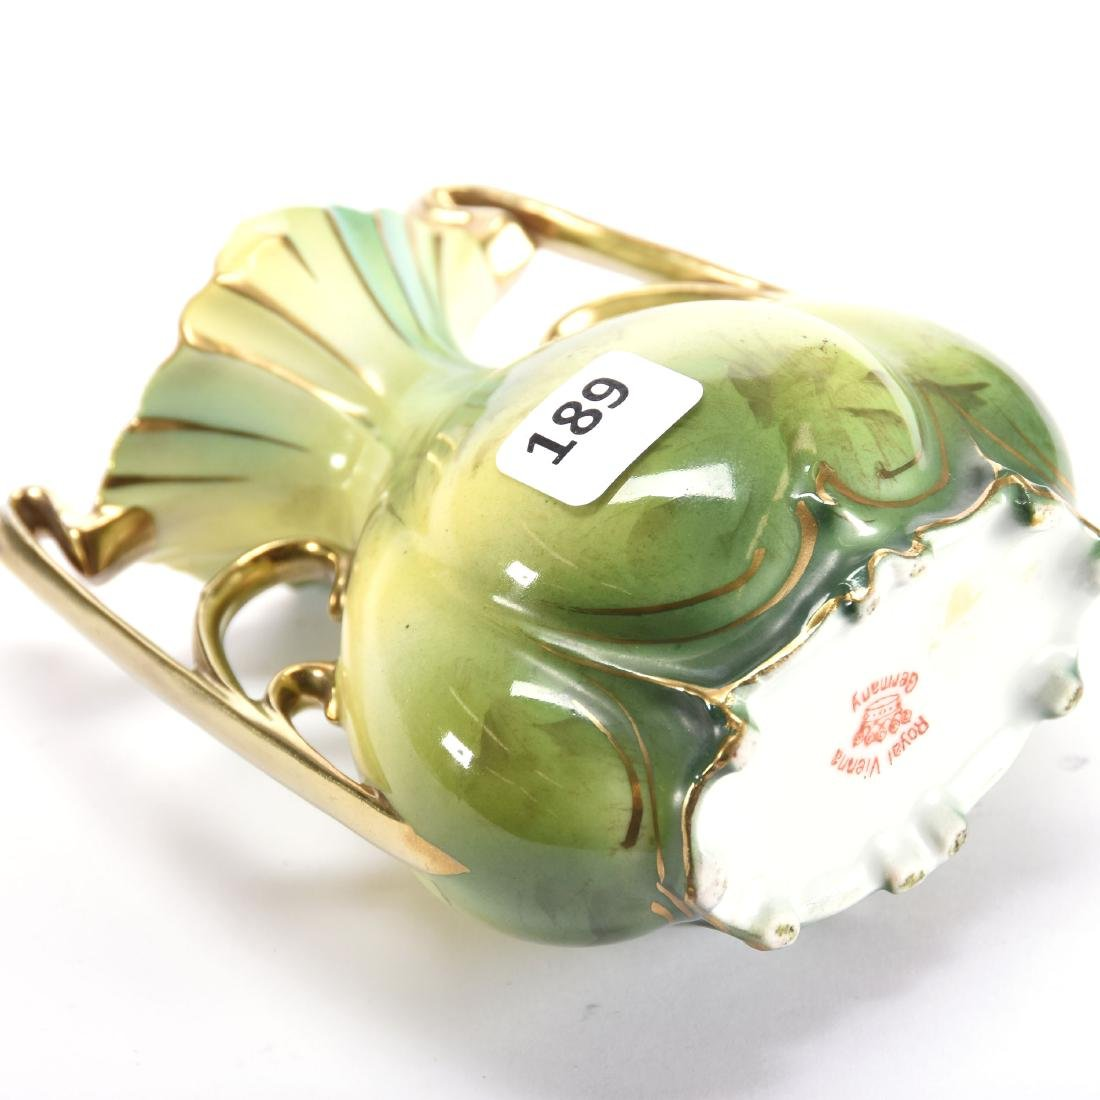 "Vase Marked Royal Vienna 5"" - 2"